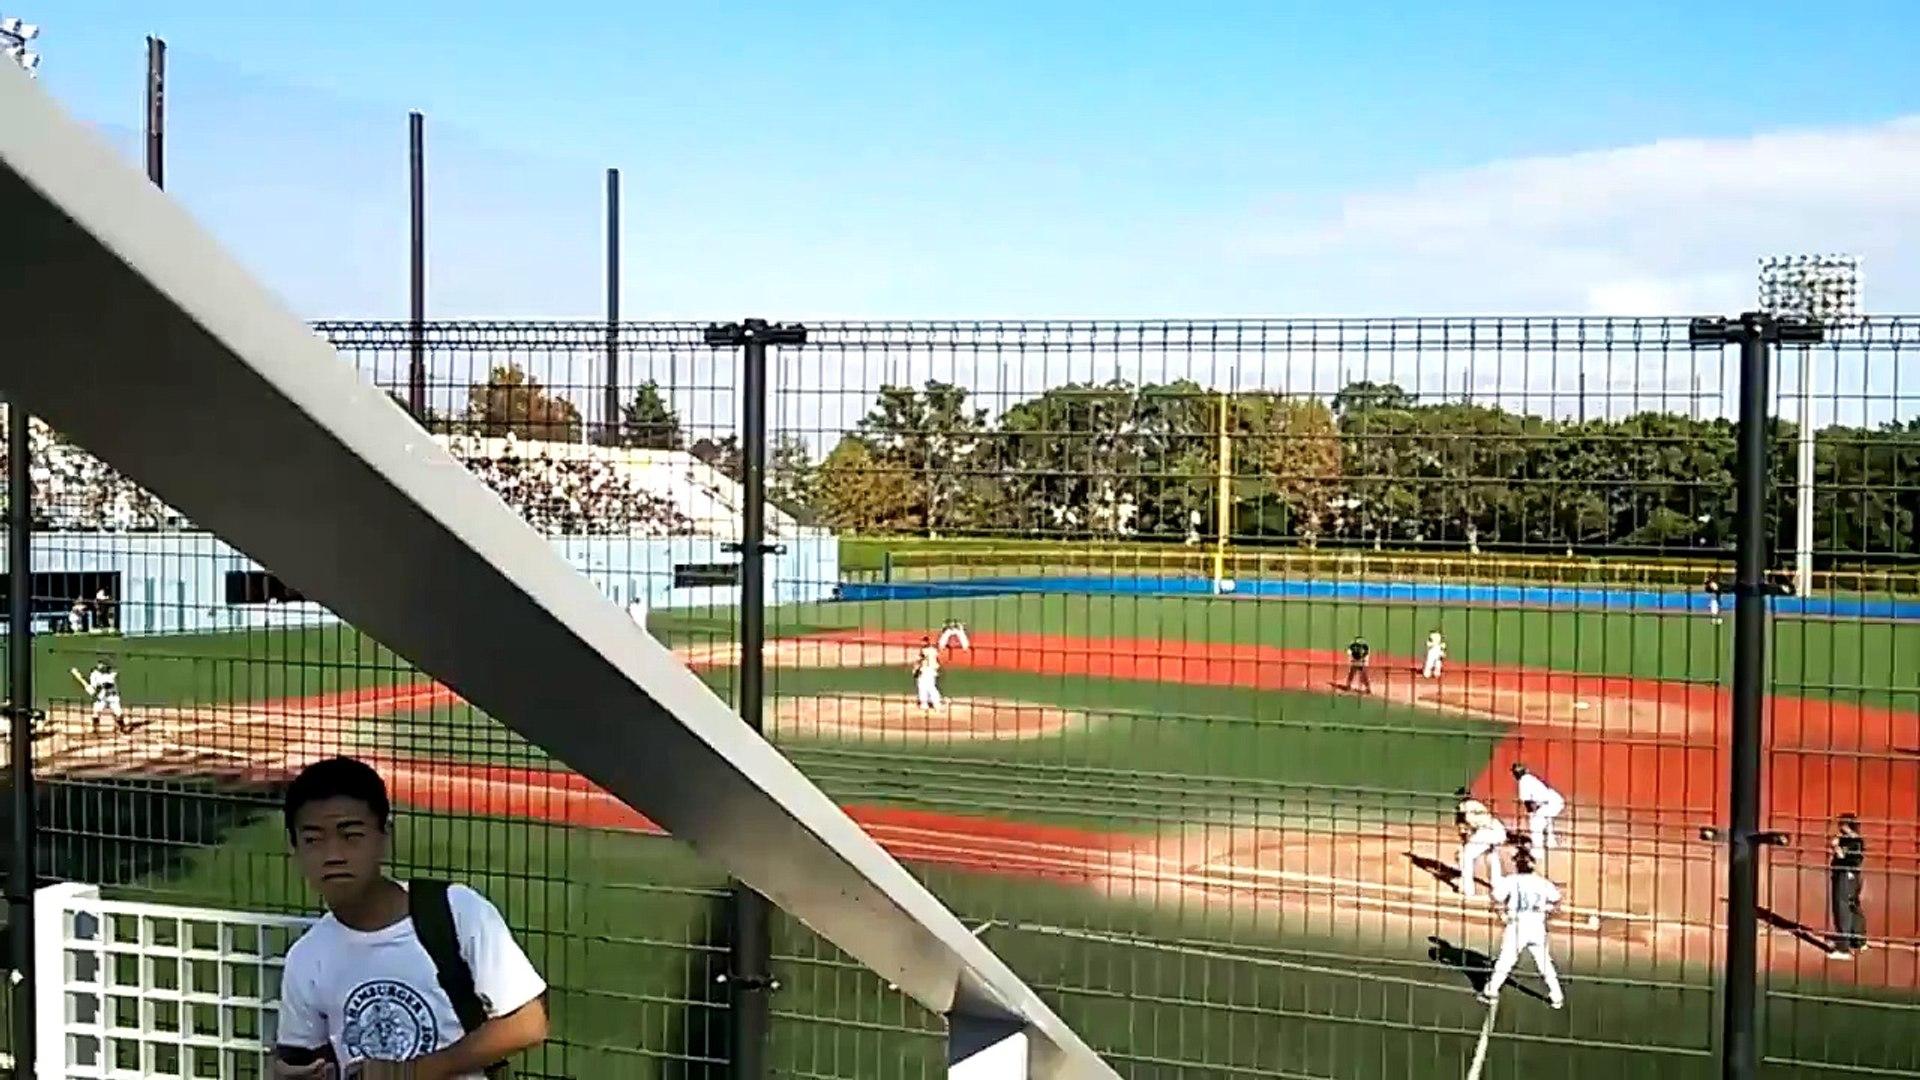 2013/09/29 横浜DeNA 細山田武史 ファーム応援歌